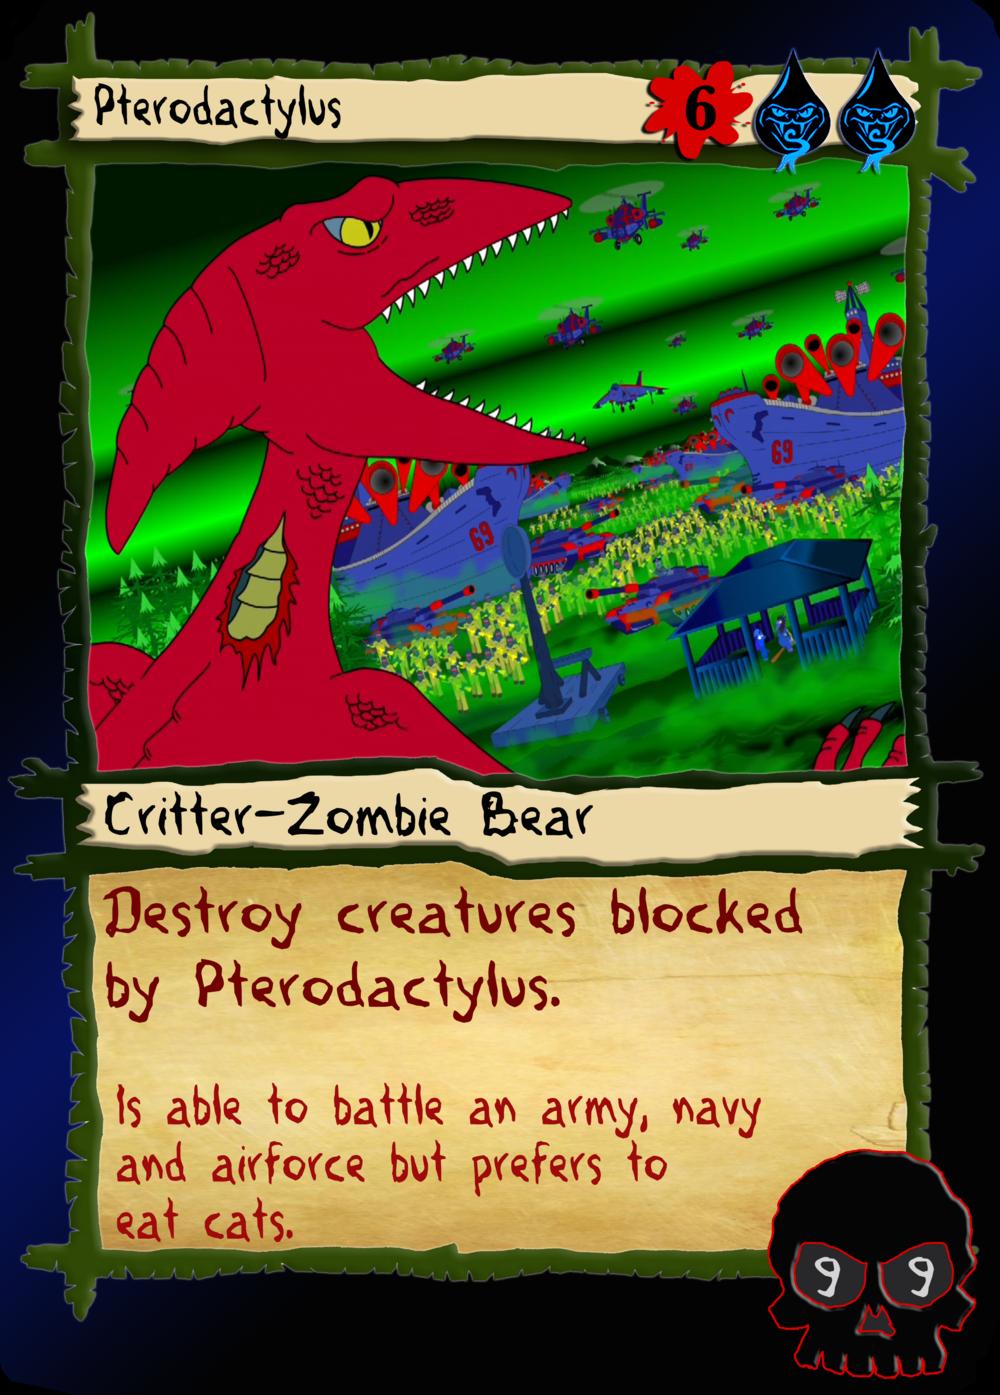 21_Pterodactylus.png